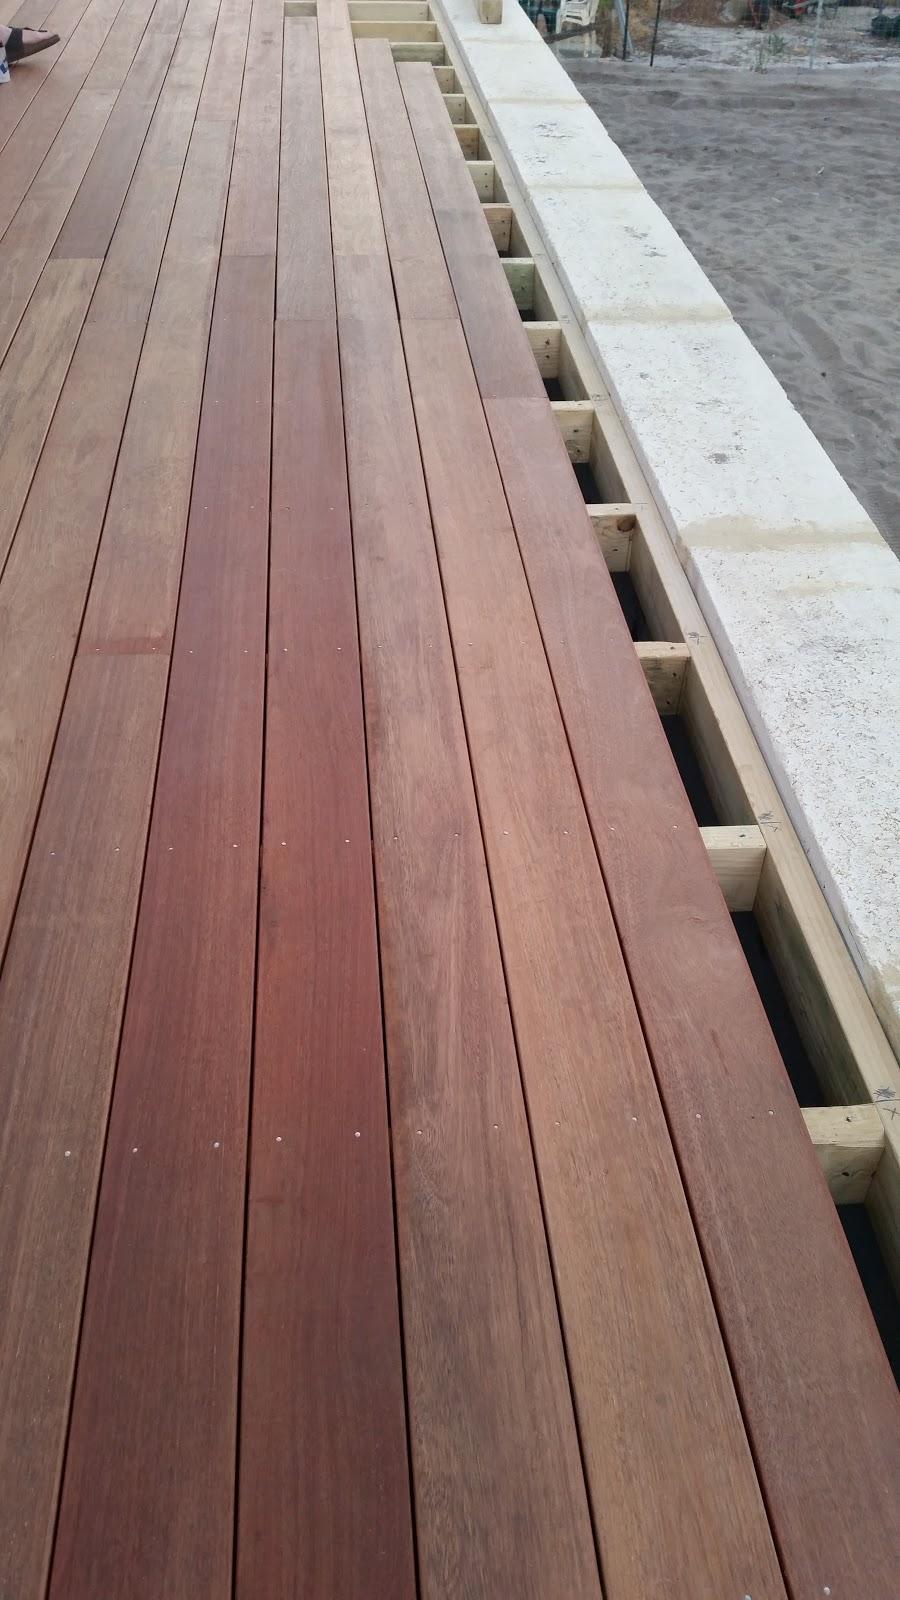 Jarrah jungle backyard progress our new timber deck for Timber decking seconds